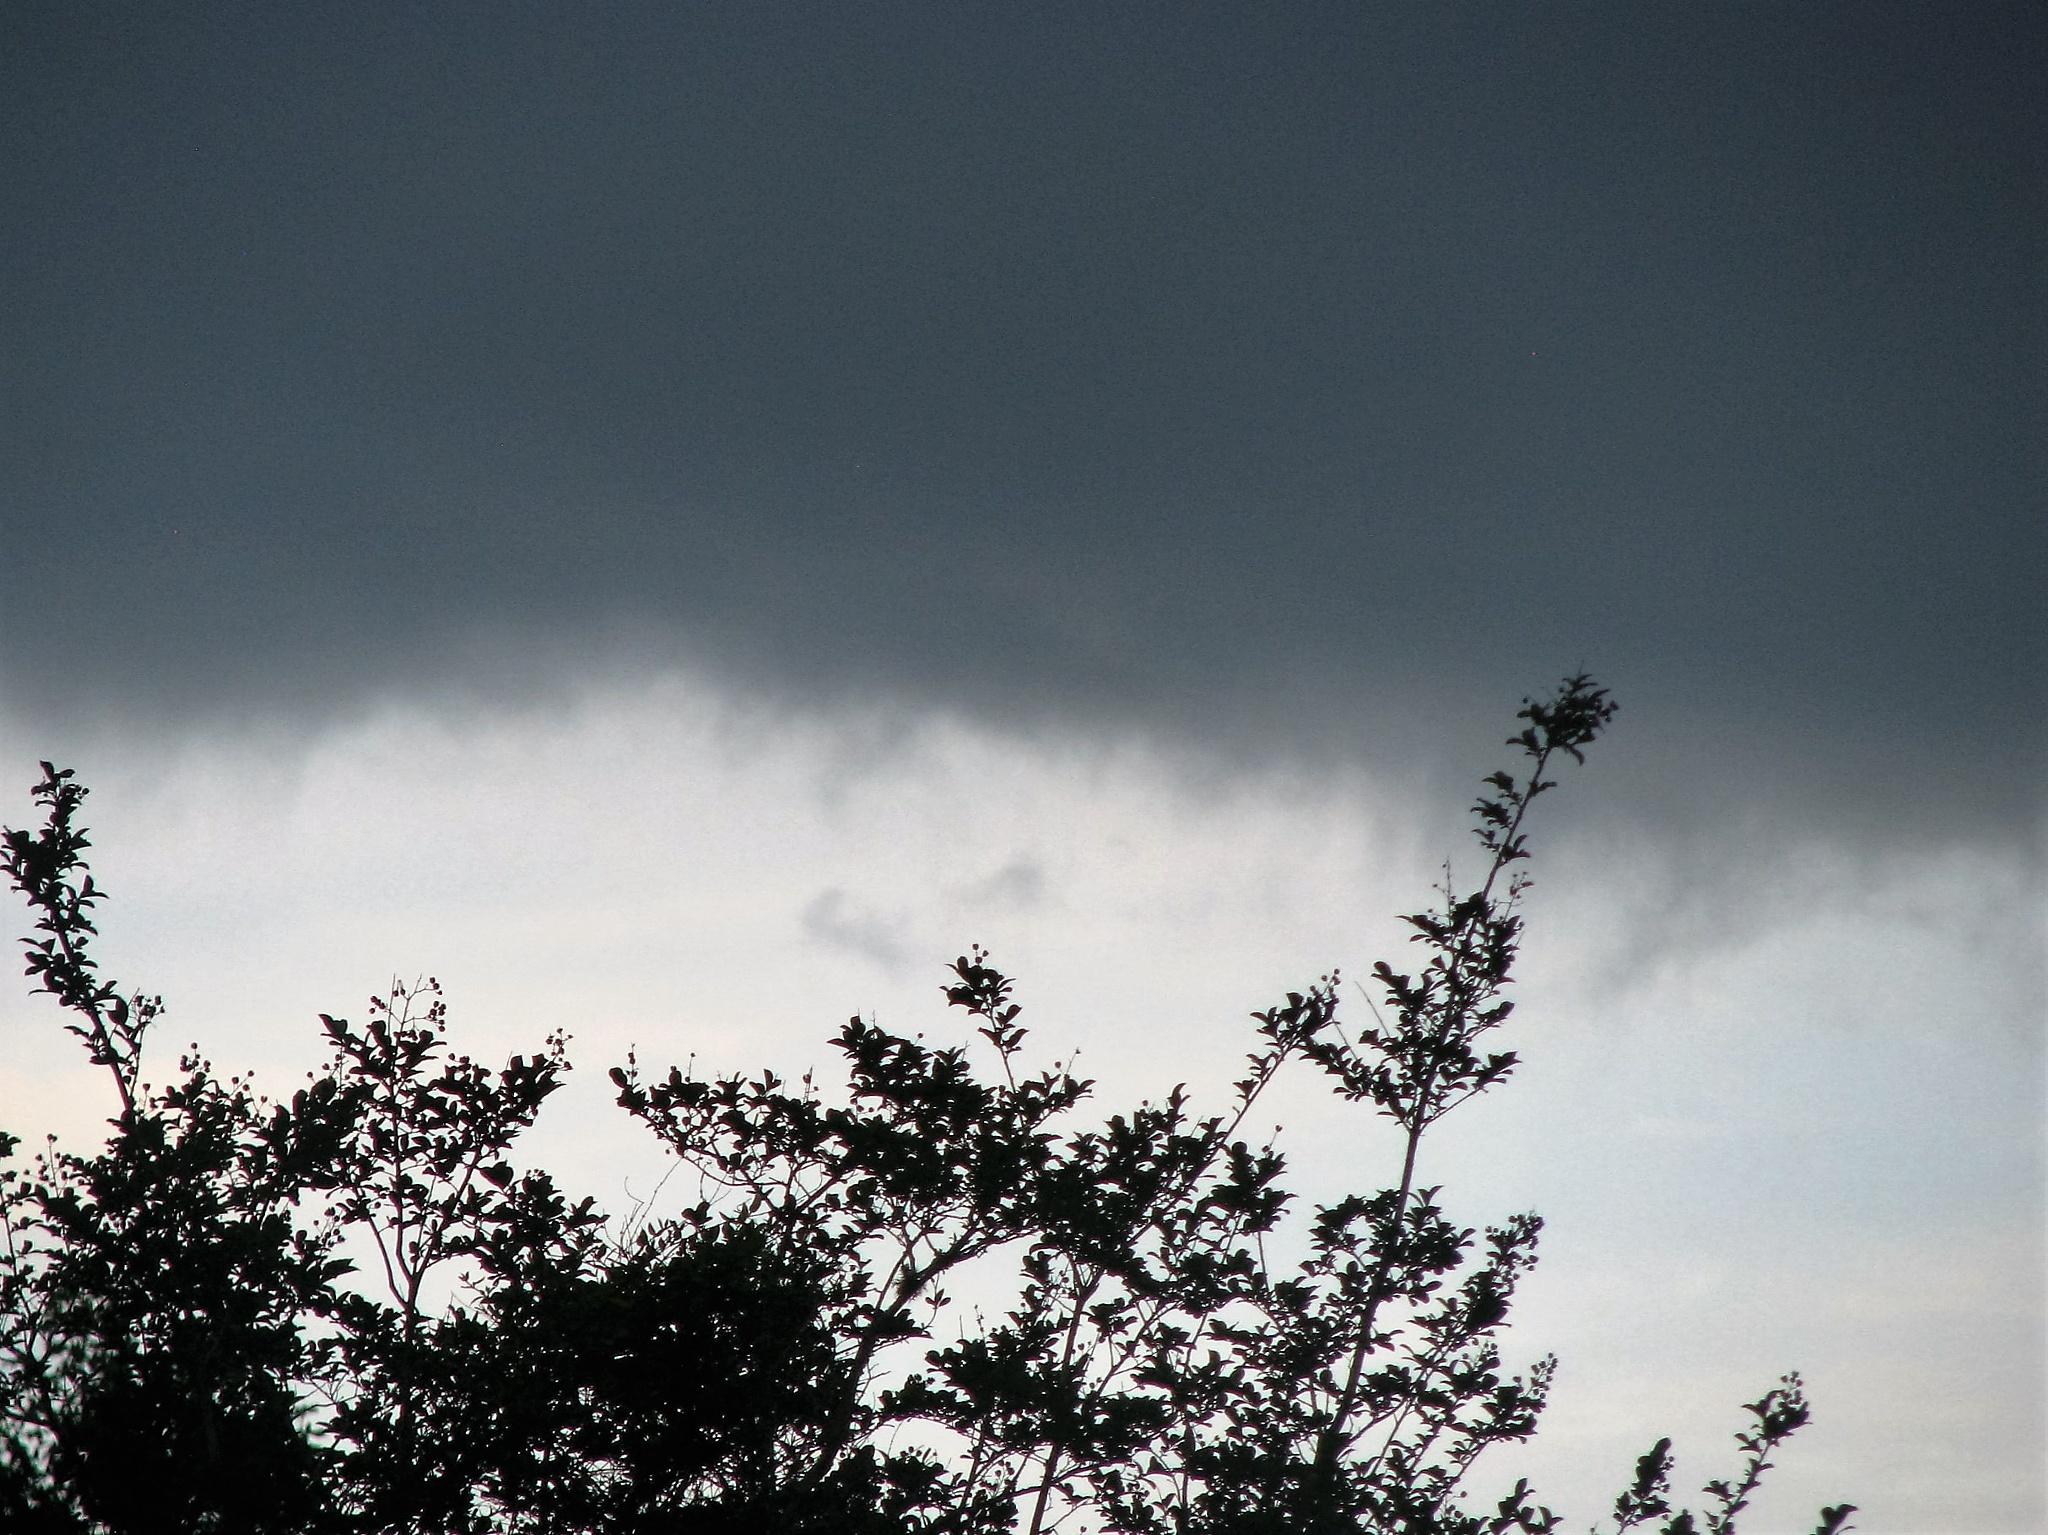 Stormy Evening 2 by nelda.sue